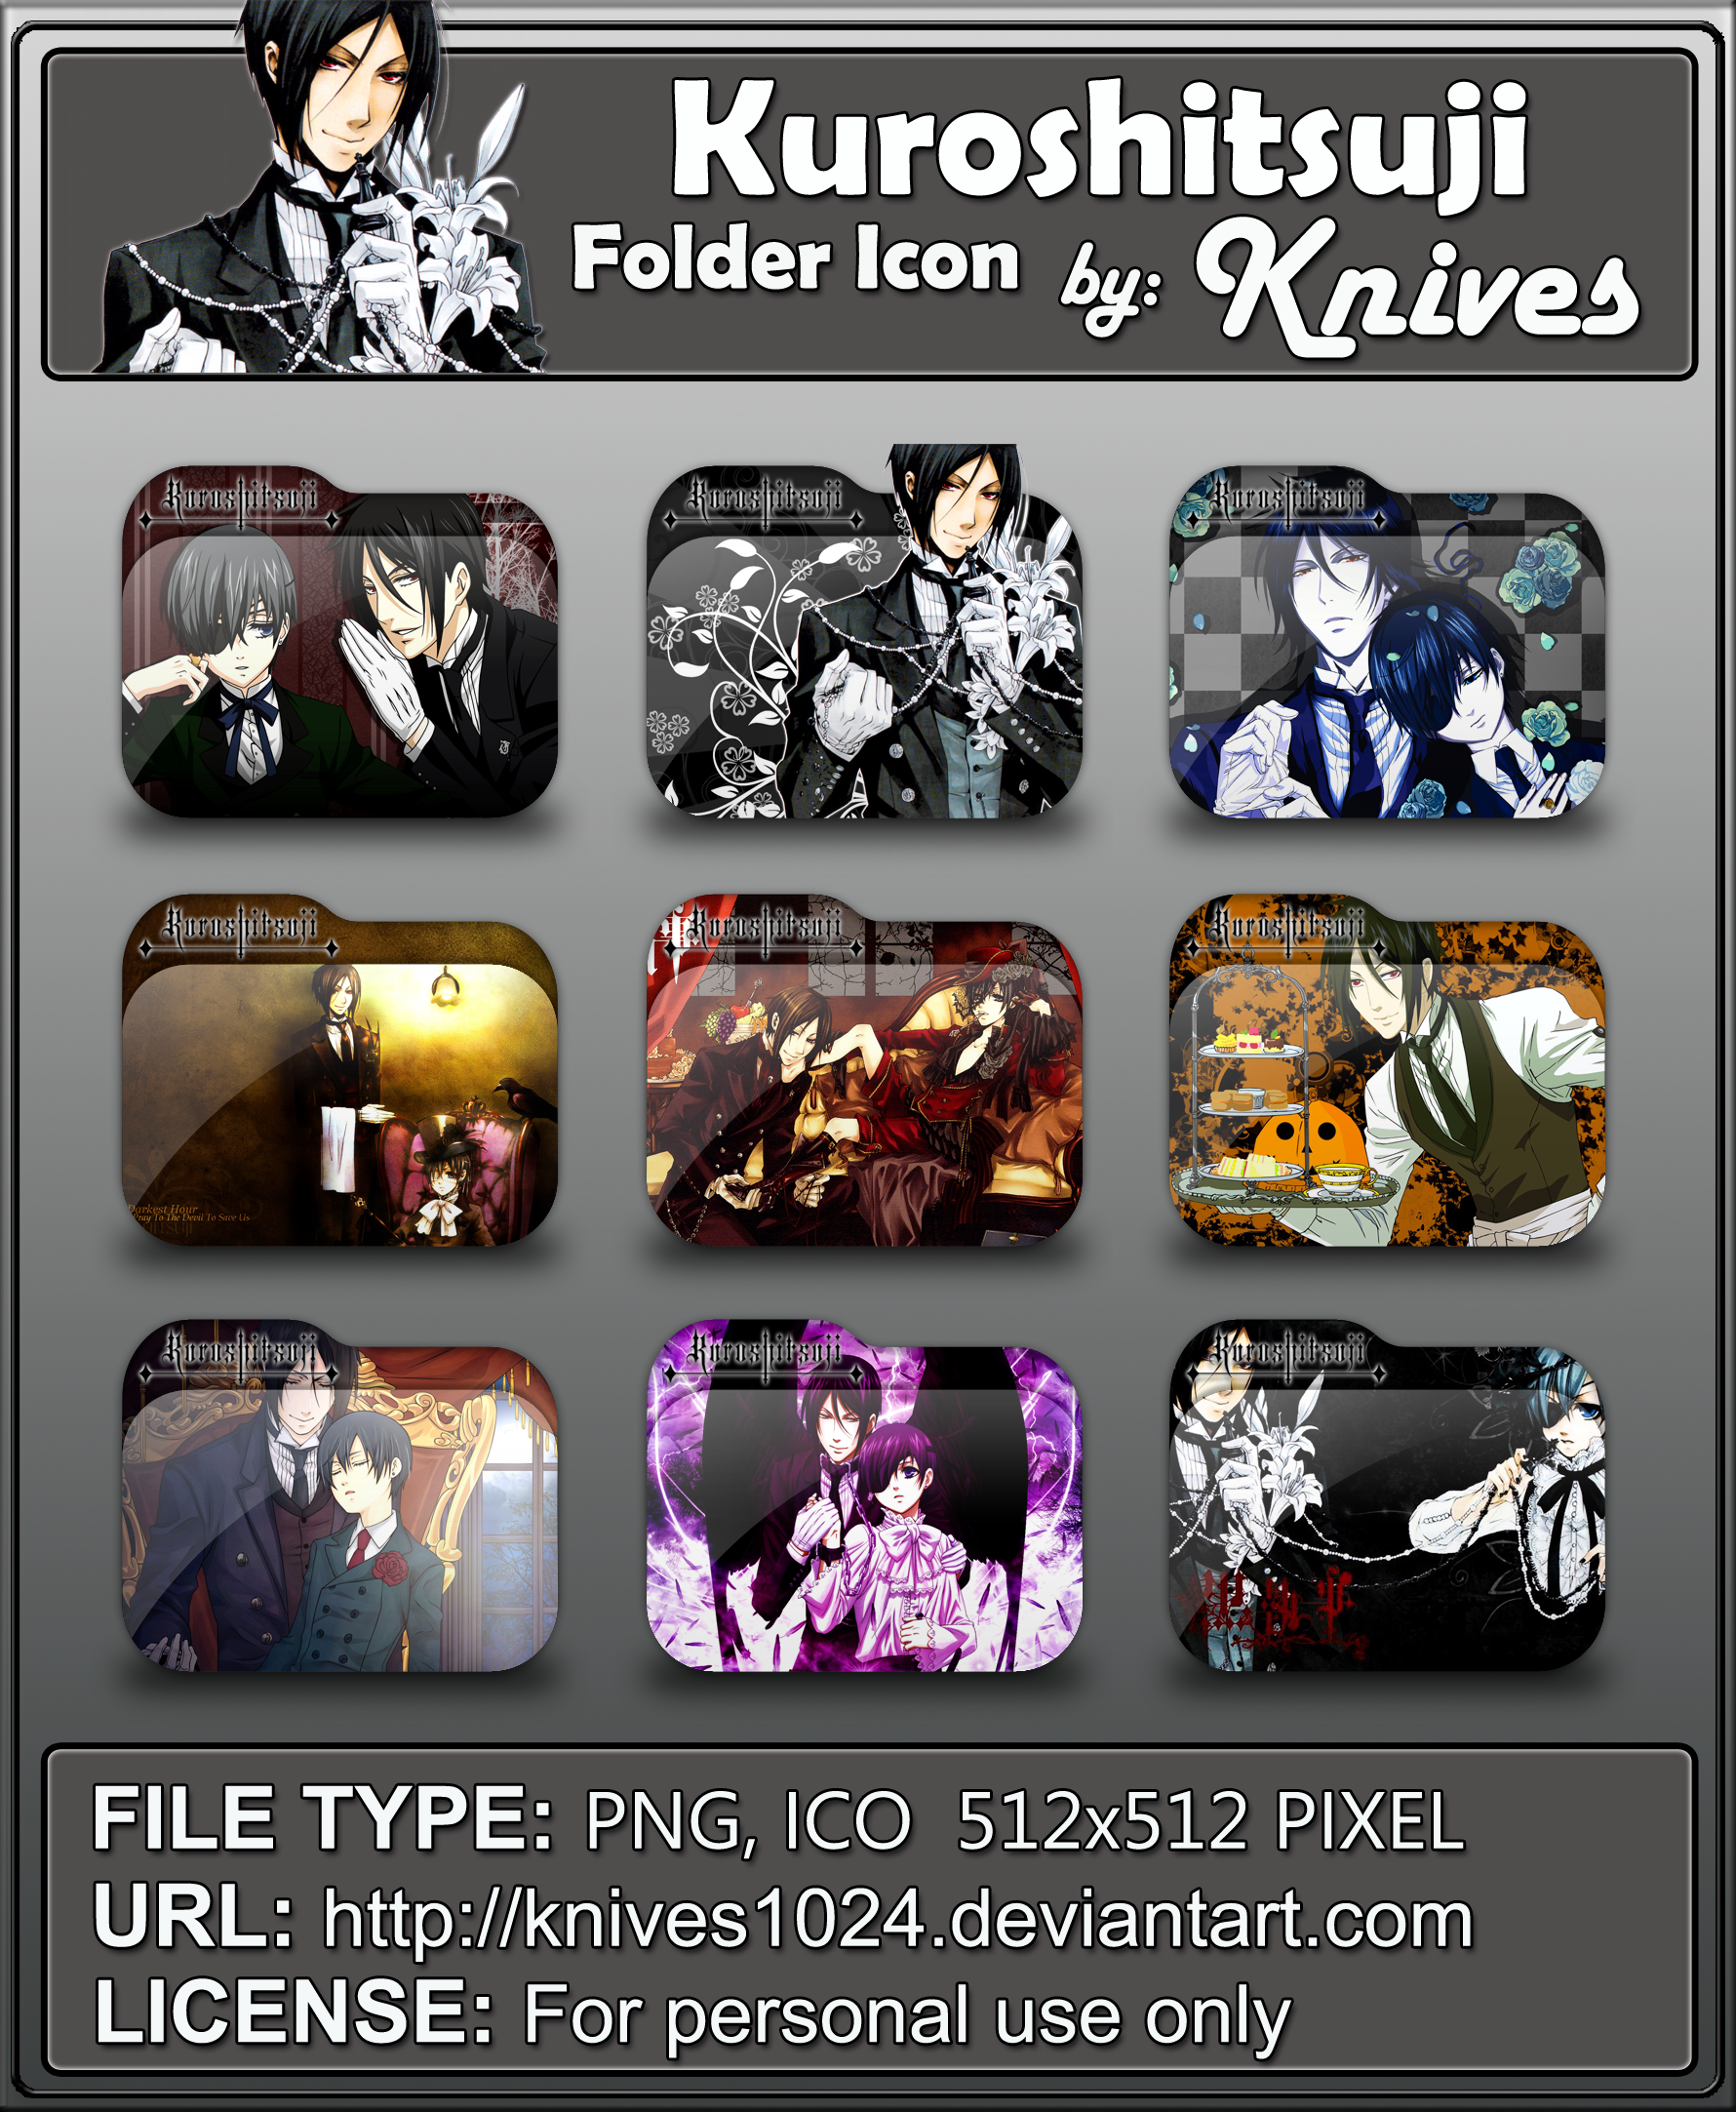 Kuroshitsuji Anime Folder Icon by Knives by knives1024